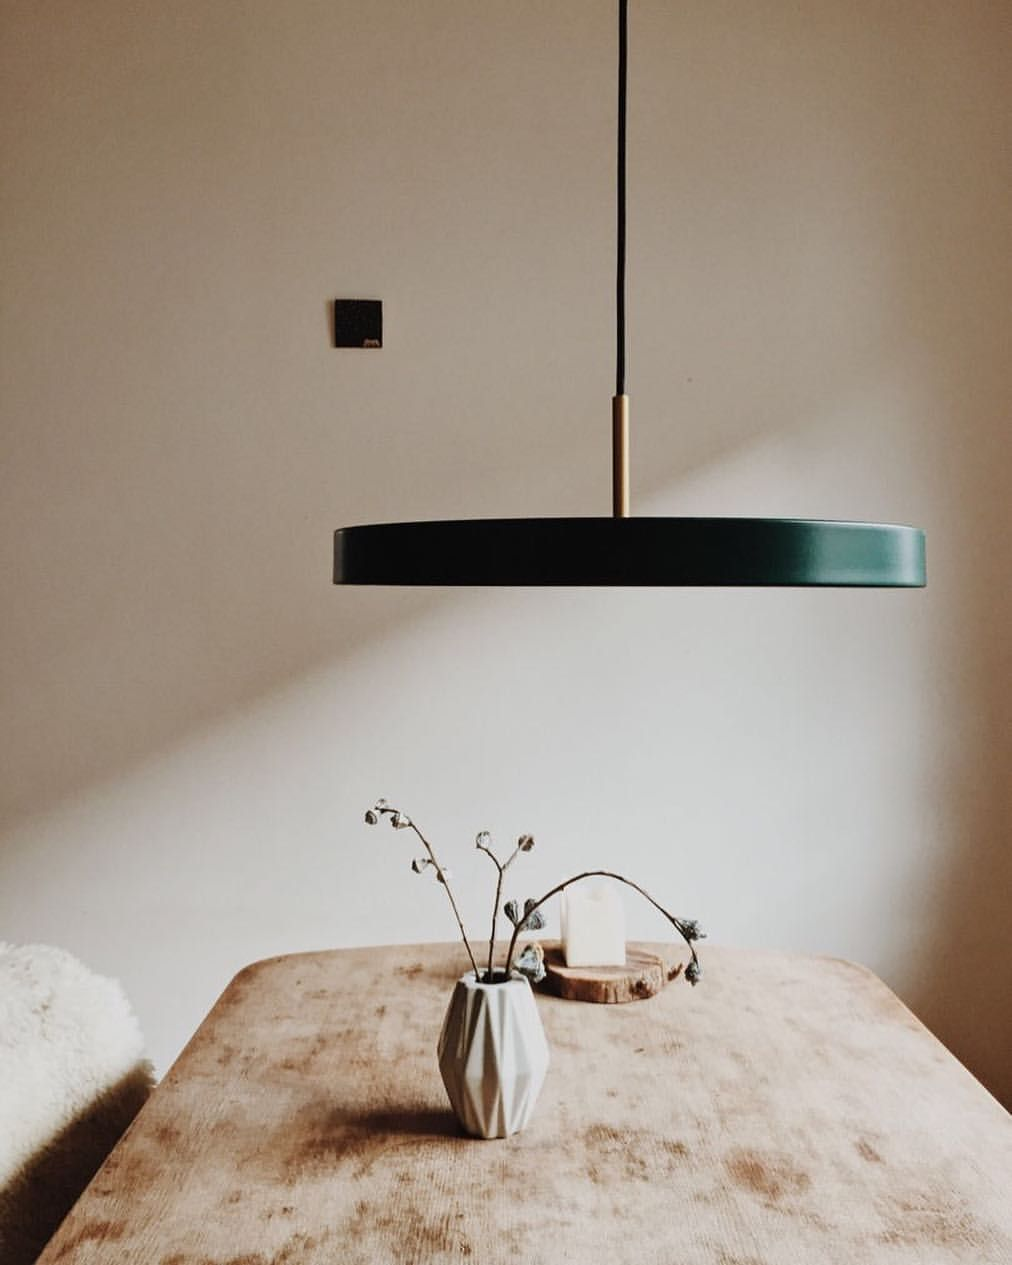 Minimale Esstisch Beleuchtung Von Vita Copenhagen Instagraminteriorchallenge Light Diningtable Dining Table Lighting Interior Design Living Room Decor